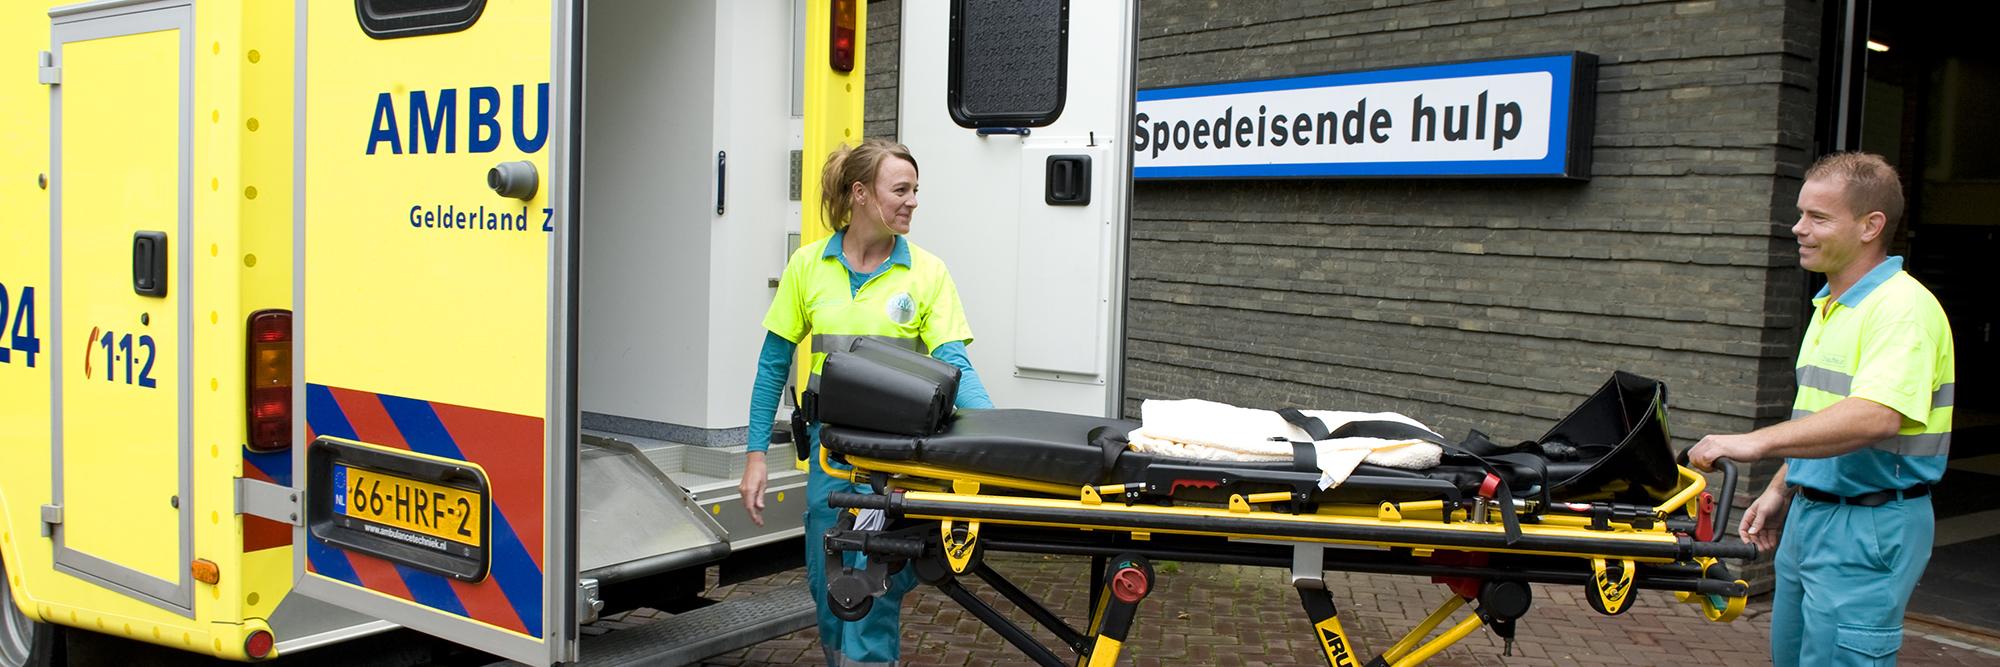 Ambulance-brancard-62-01_breed